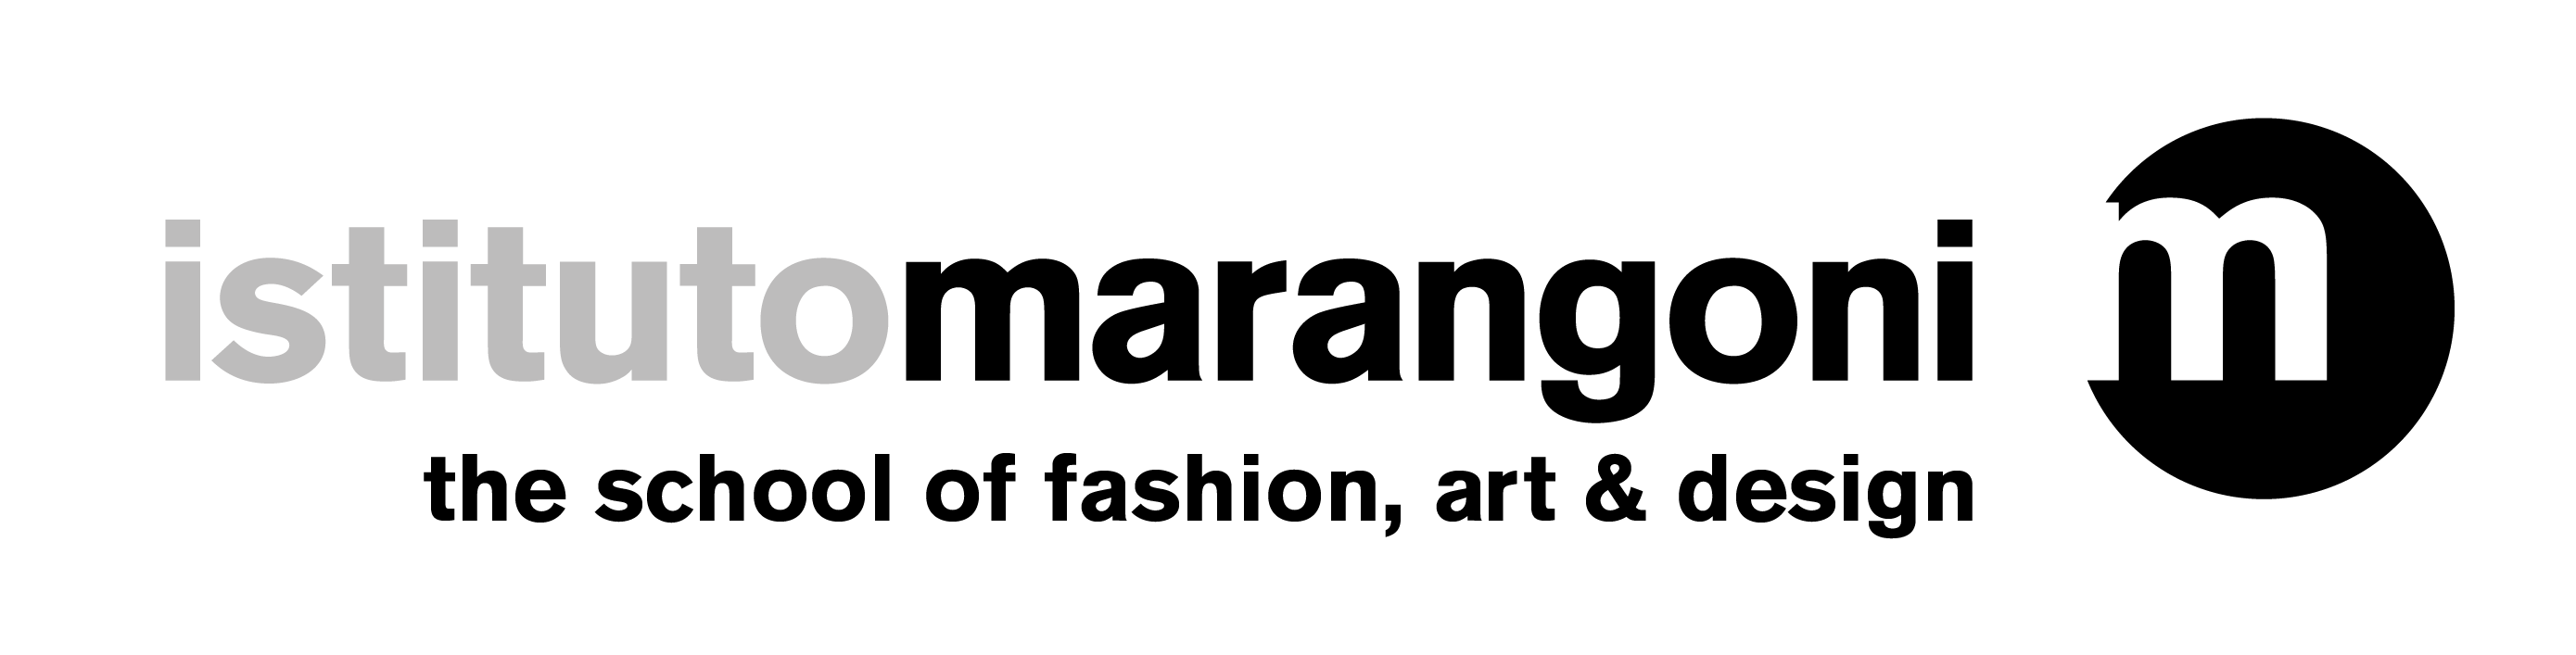 Istituto Marangoni Italy